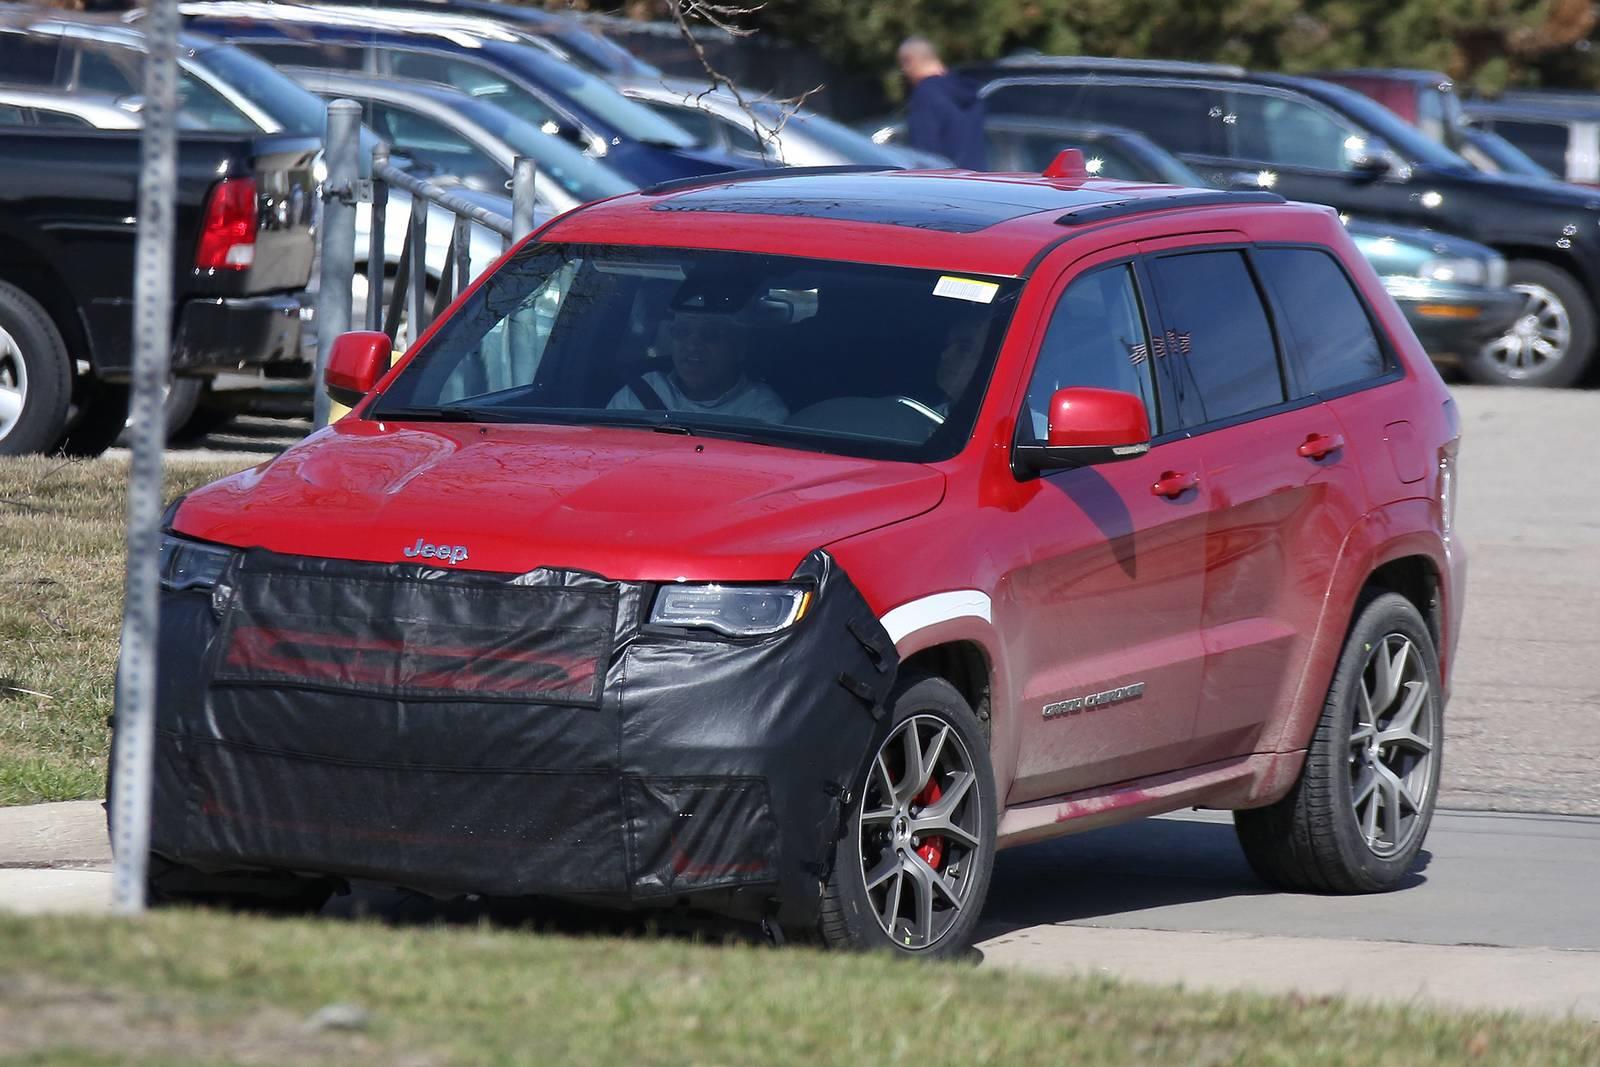 2019 Jeep Grand Cherokee >> 2018 Jeep Grand Cherokee Trackhawk First Spy Shots - GTspirit